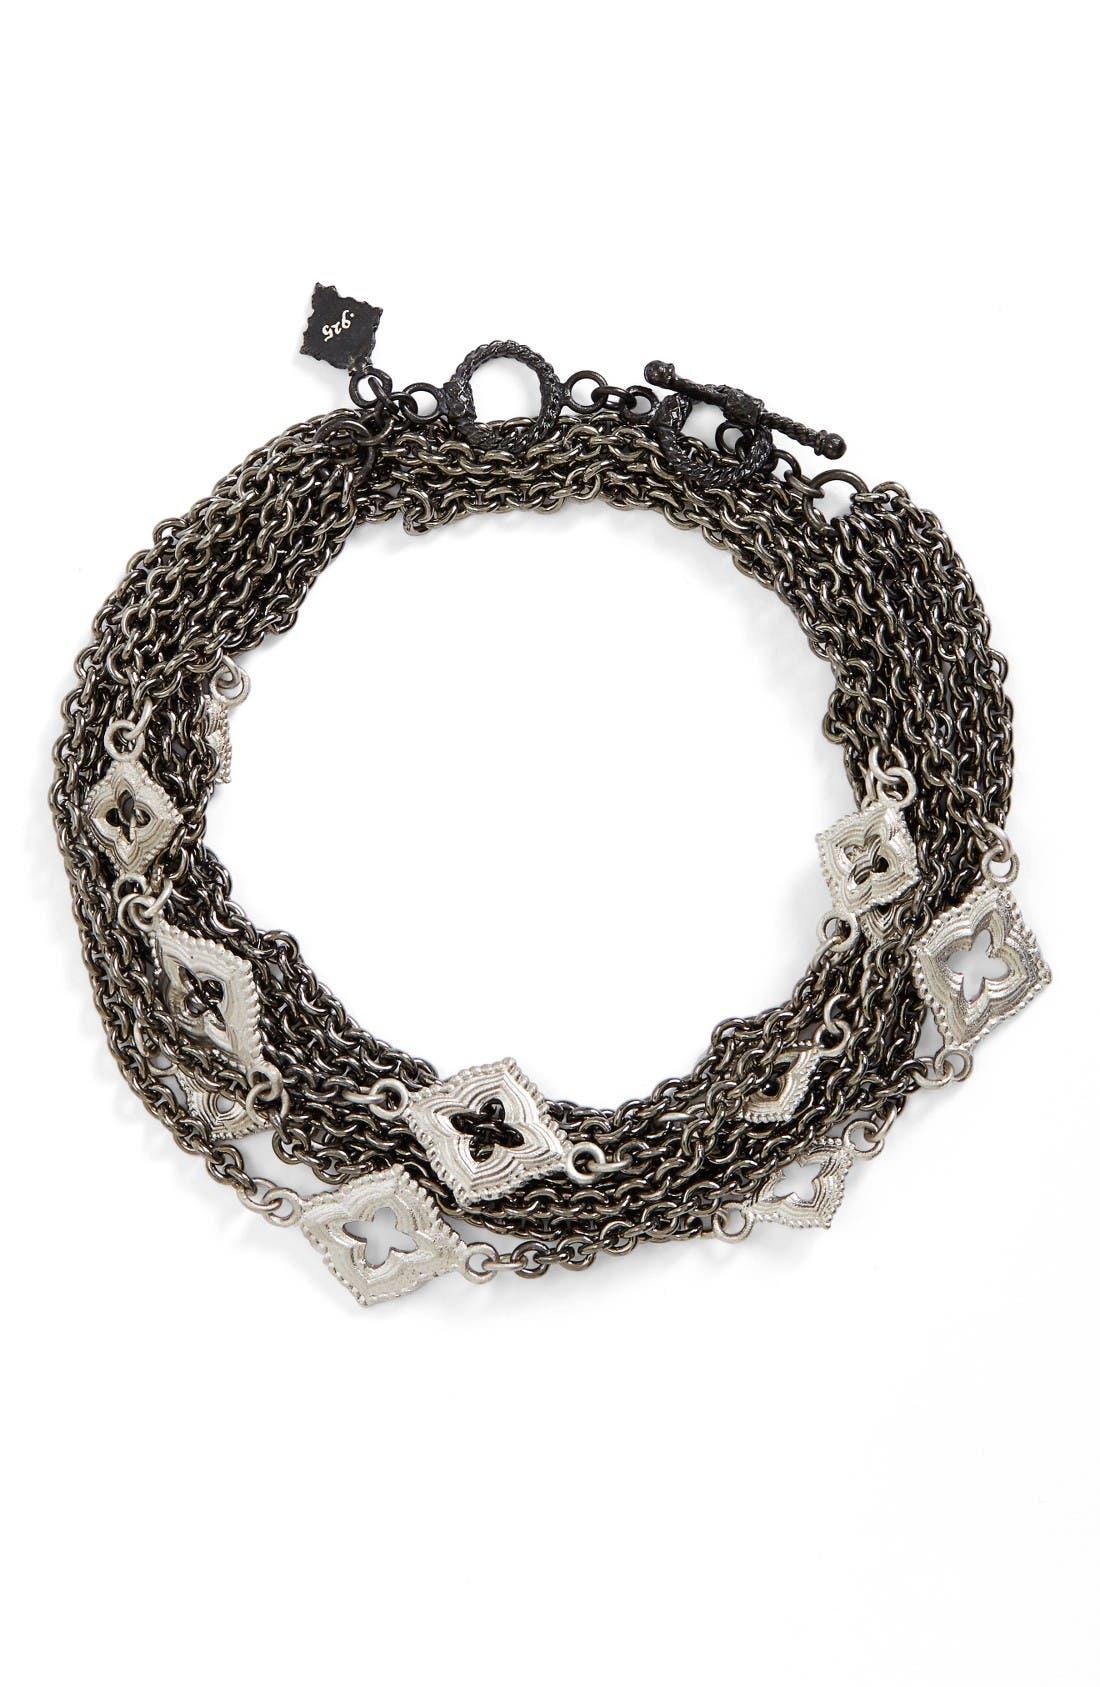 Main Image - Armenta New World Double Wrap Scroll Bracelet